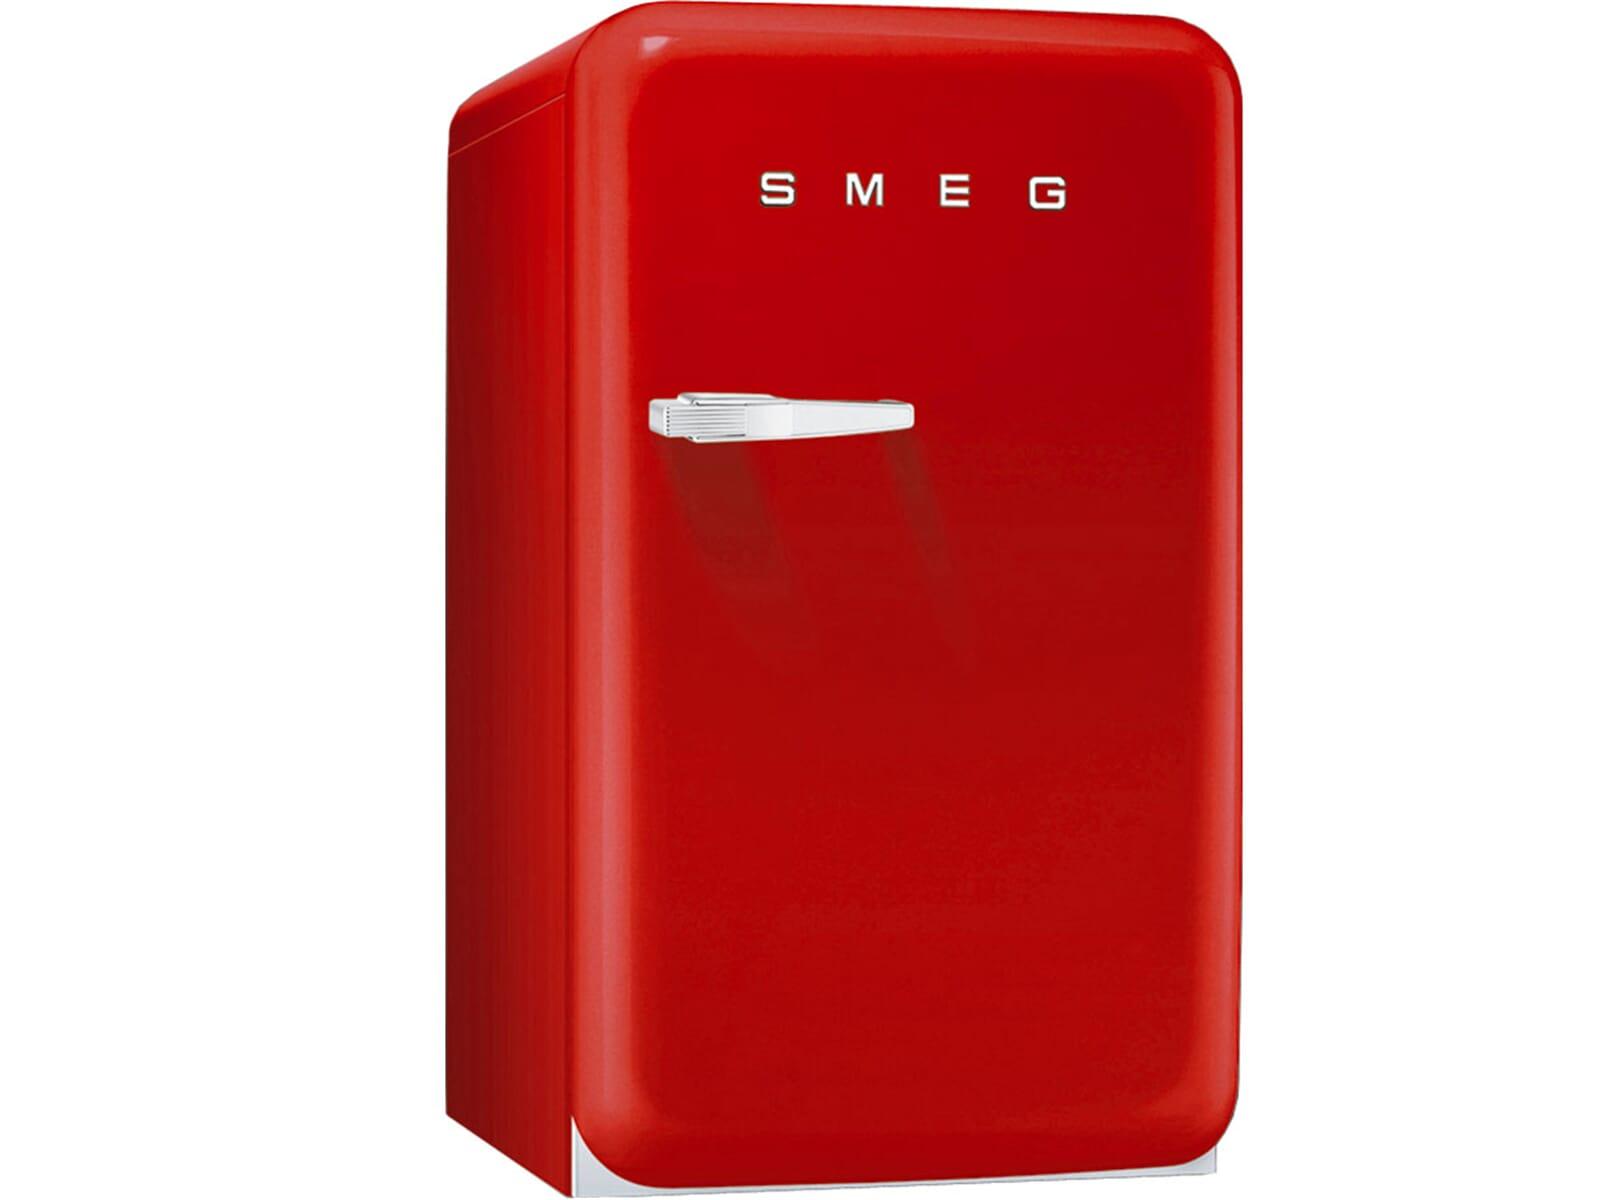 Smeg Kühlschrank Creme Gebraucht : Smeg retro kühlschrank wie smeg kuehlschrank e vi